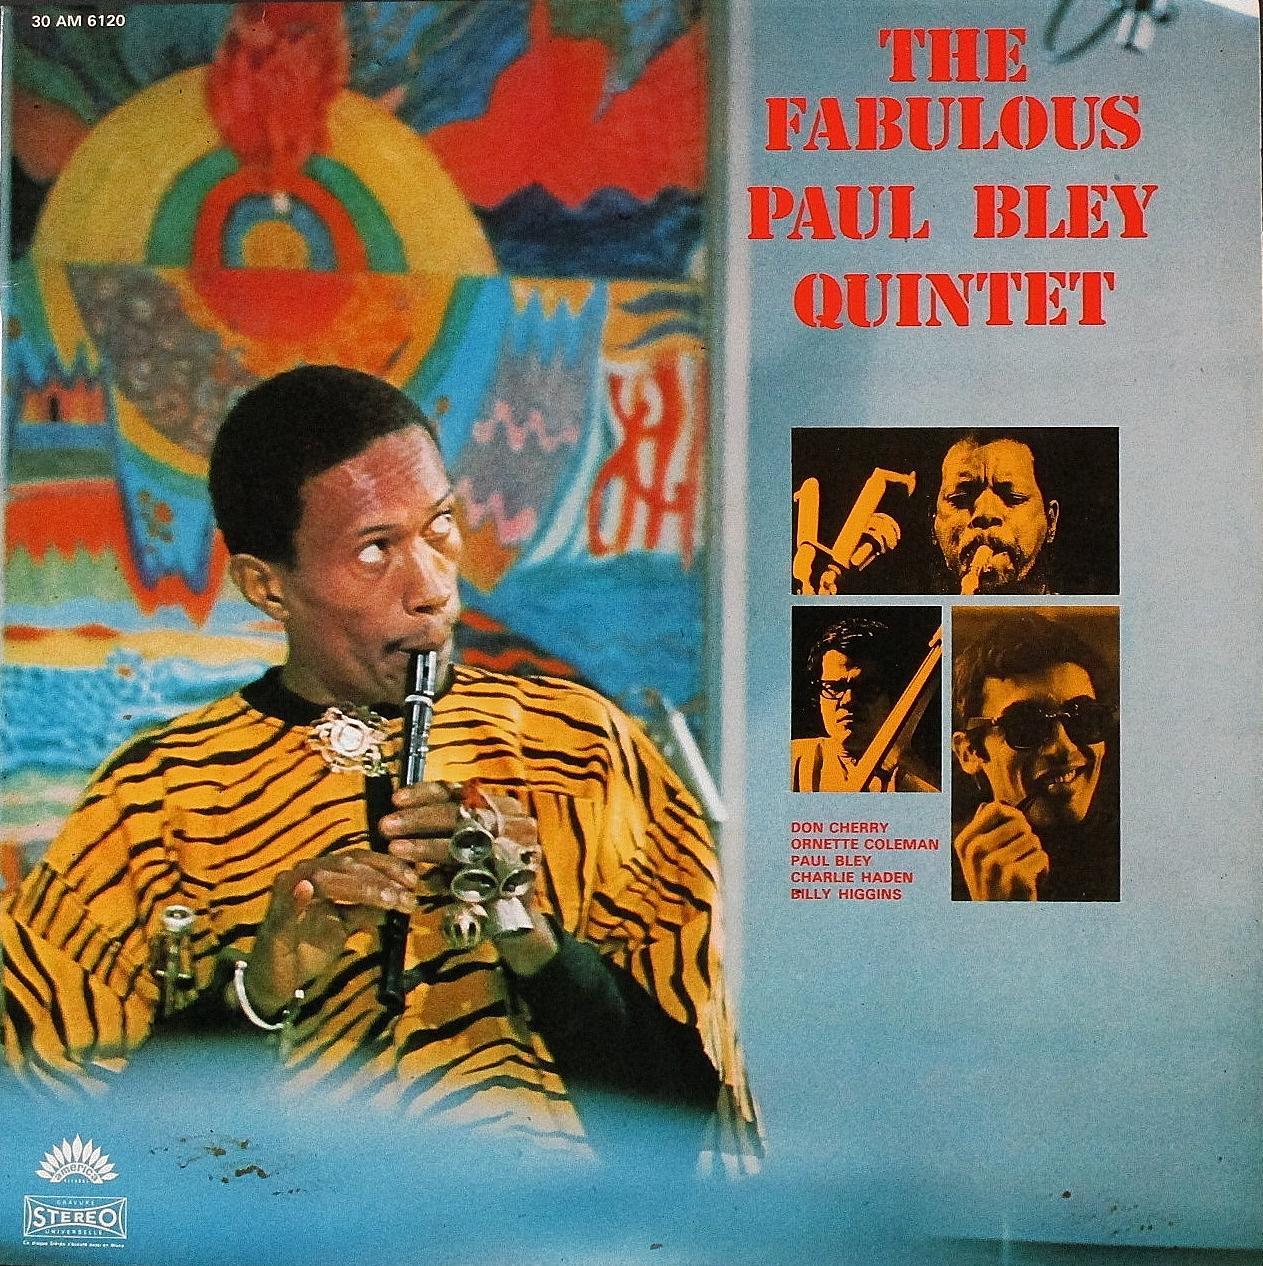 Paul Bley, Ornette Coleman, Don Cherry ポール・ブレイ、オーネット・コールマン、ドン・チェリー / The Fabulous Paul Bley Quintet